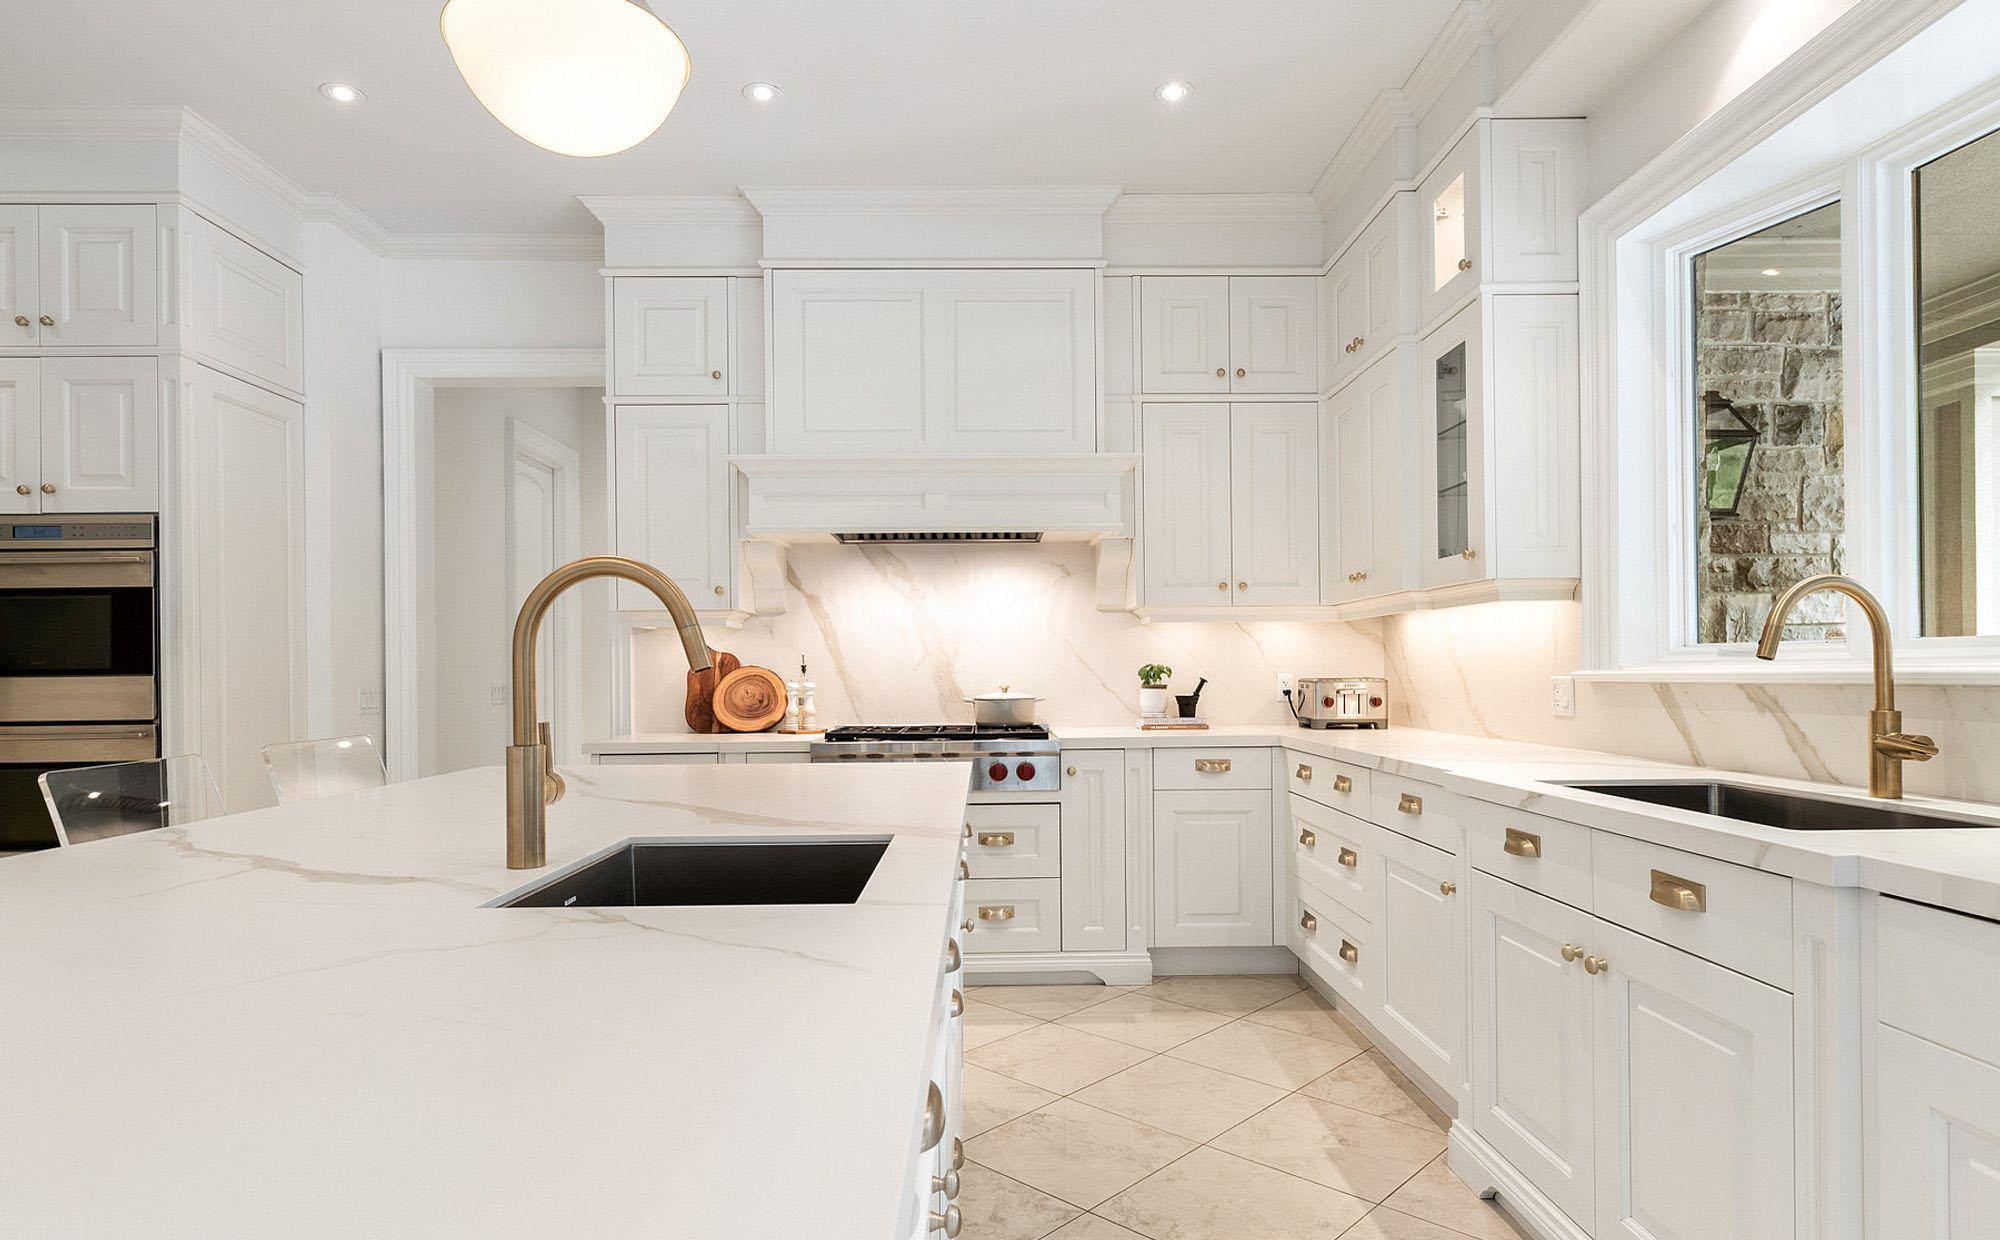 Black stone composite sinks with white quartz countertops.